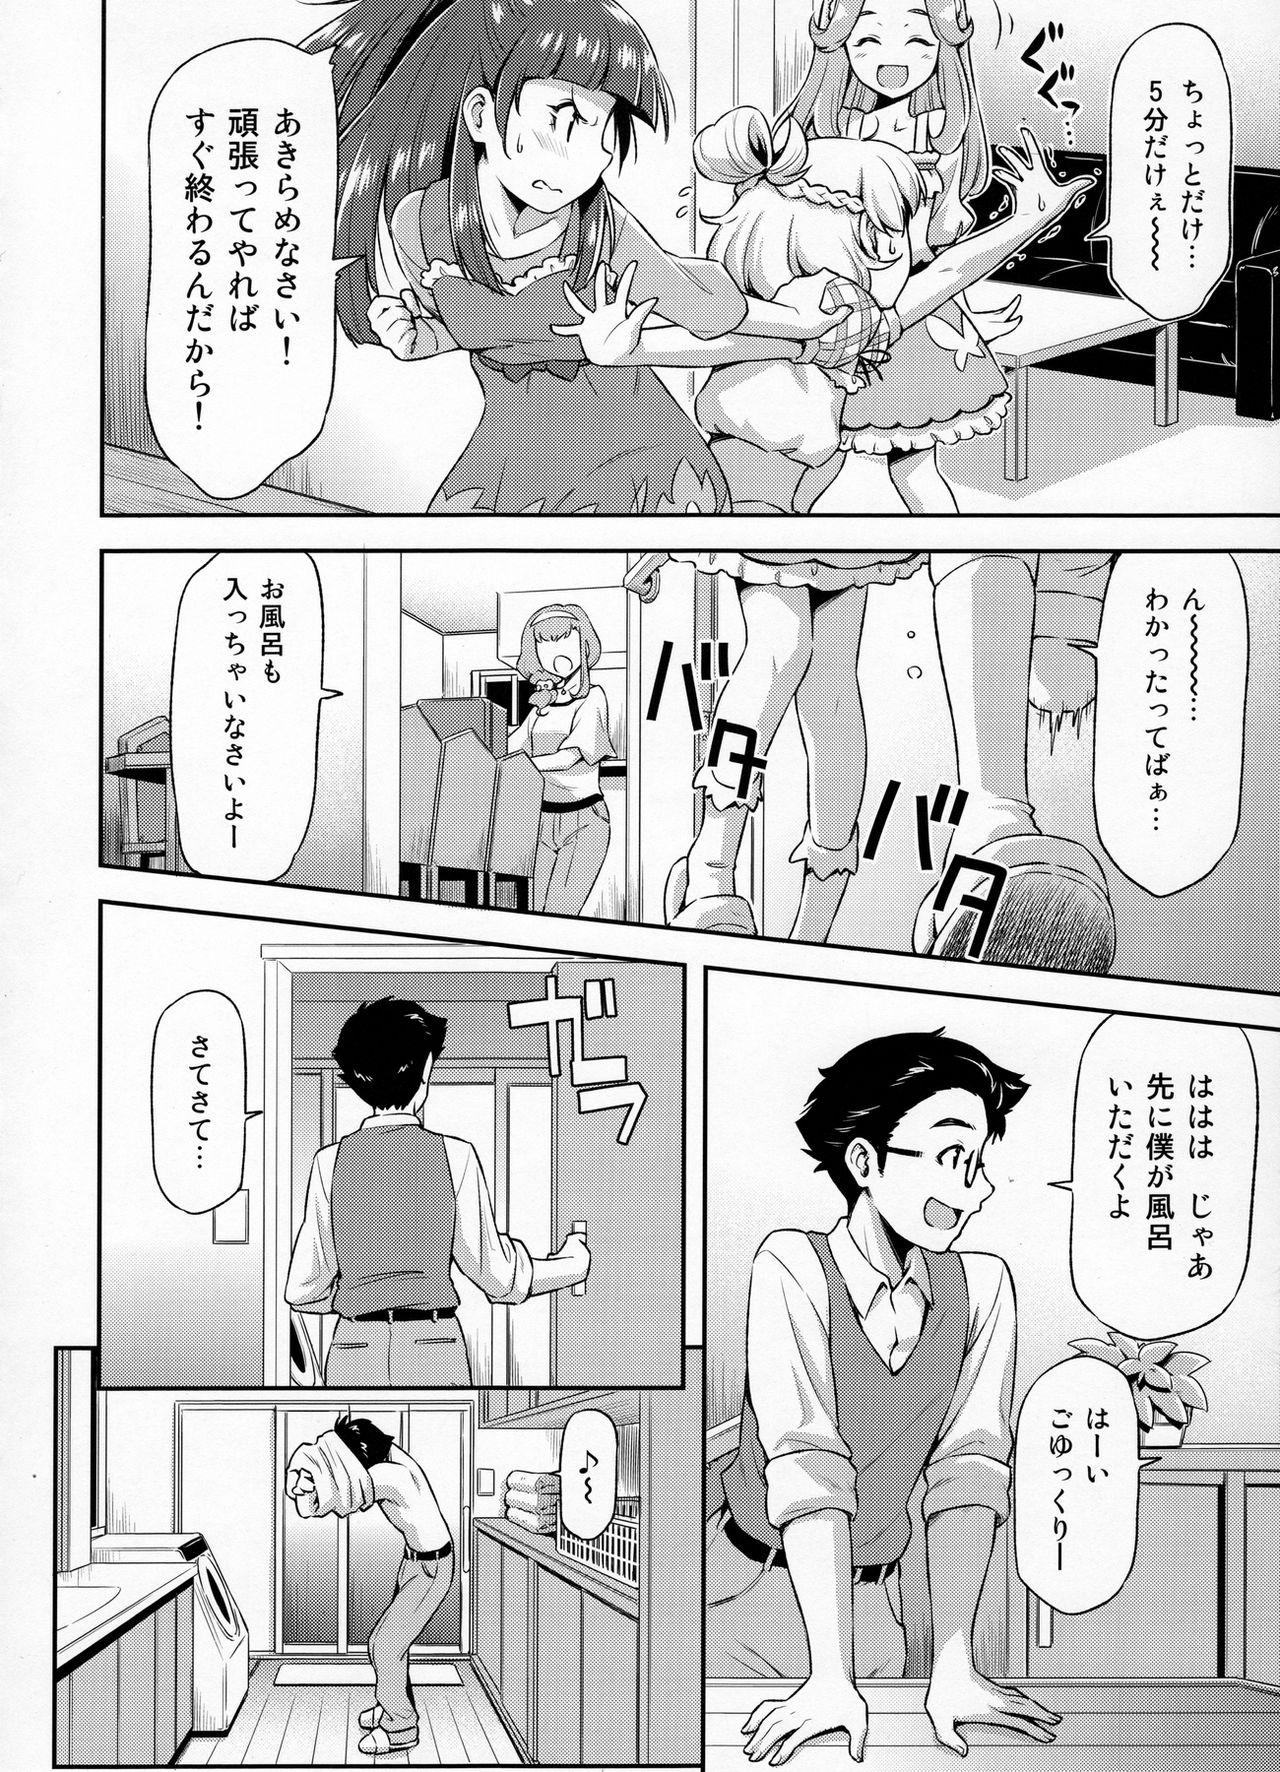 Haa-chan to Furo ni Haireba. 4